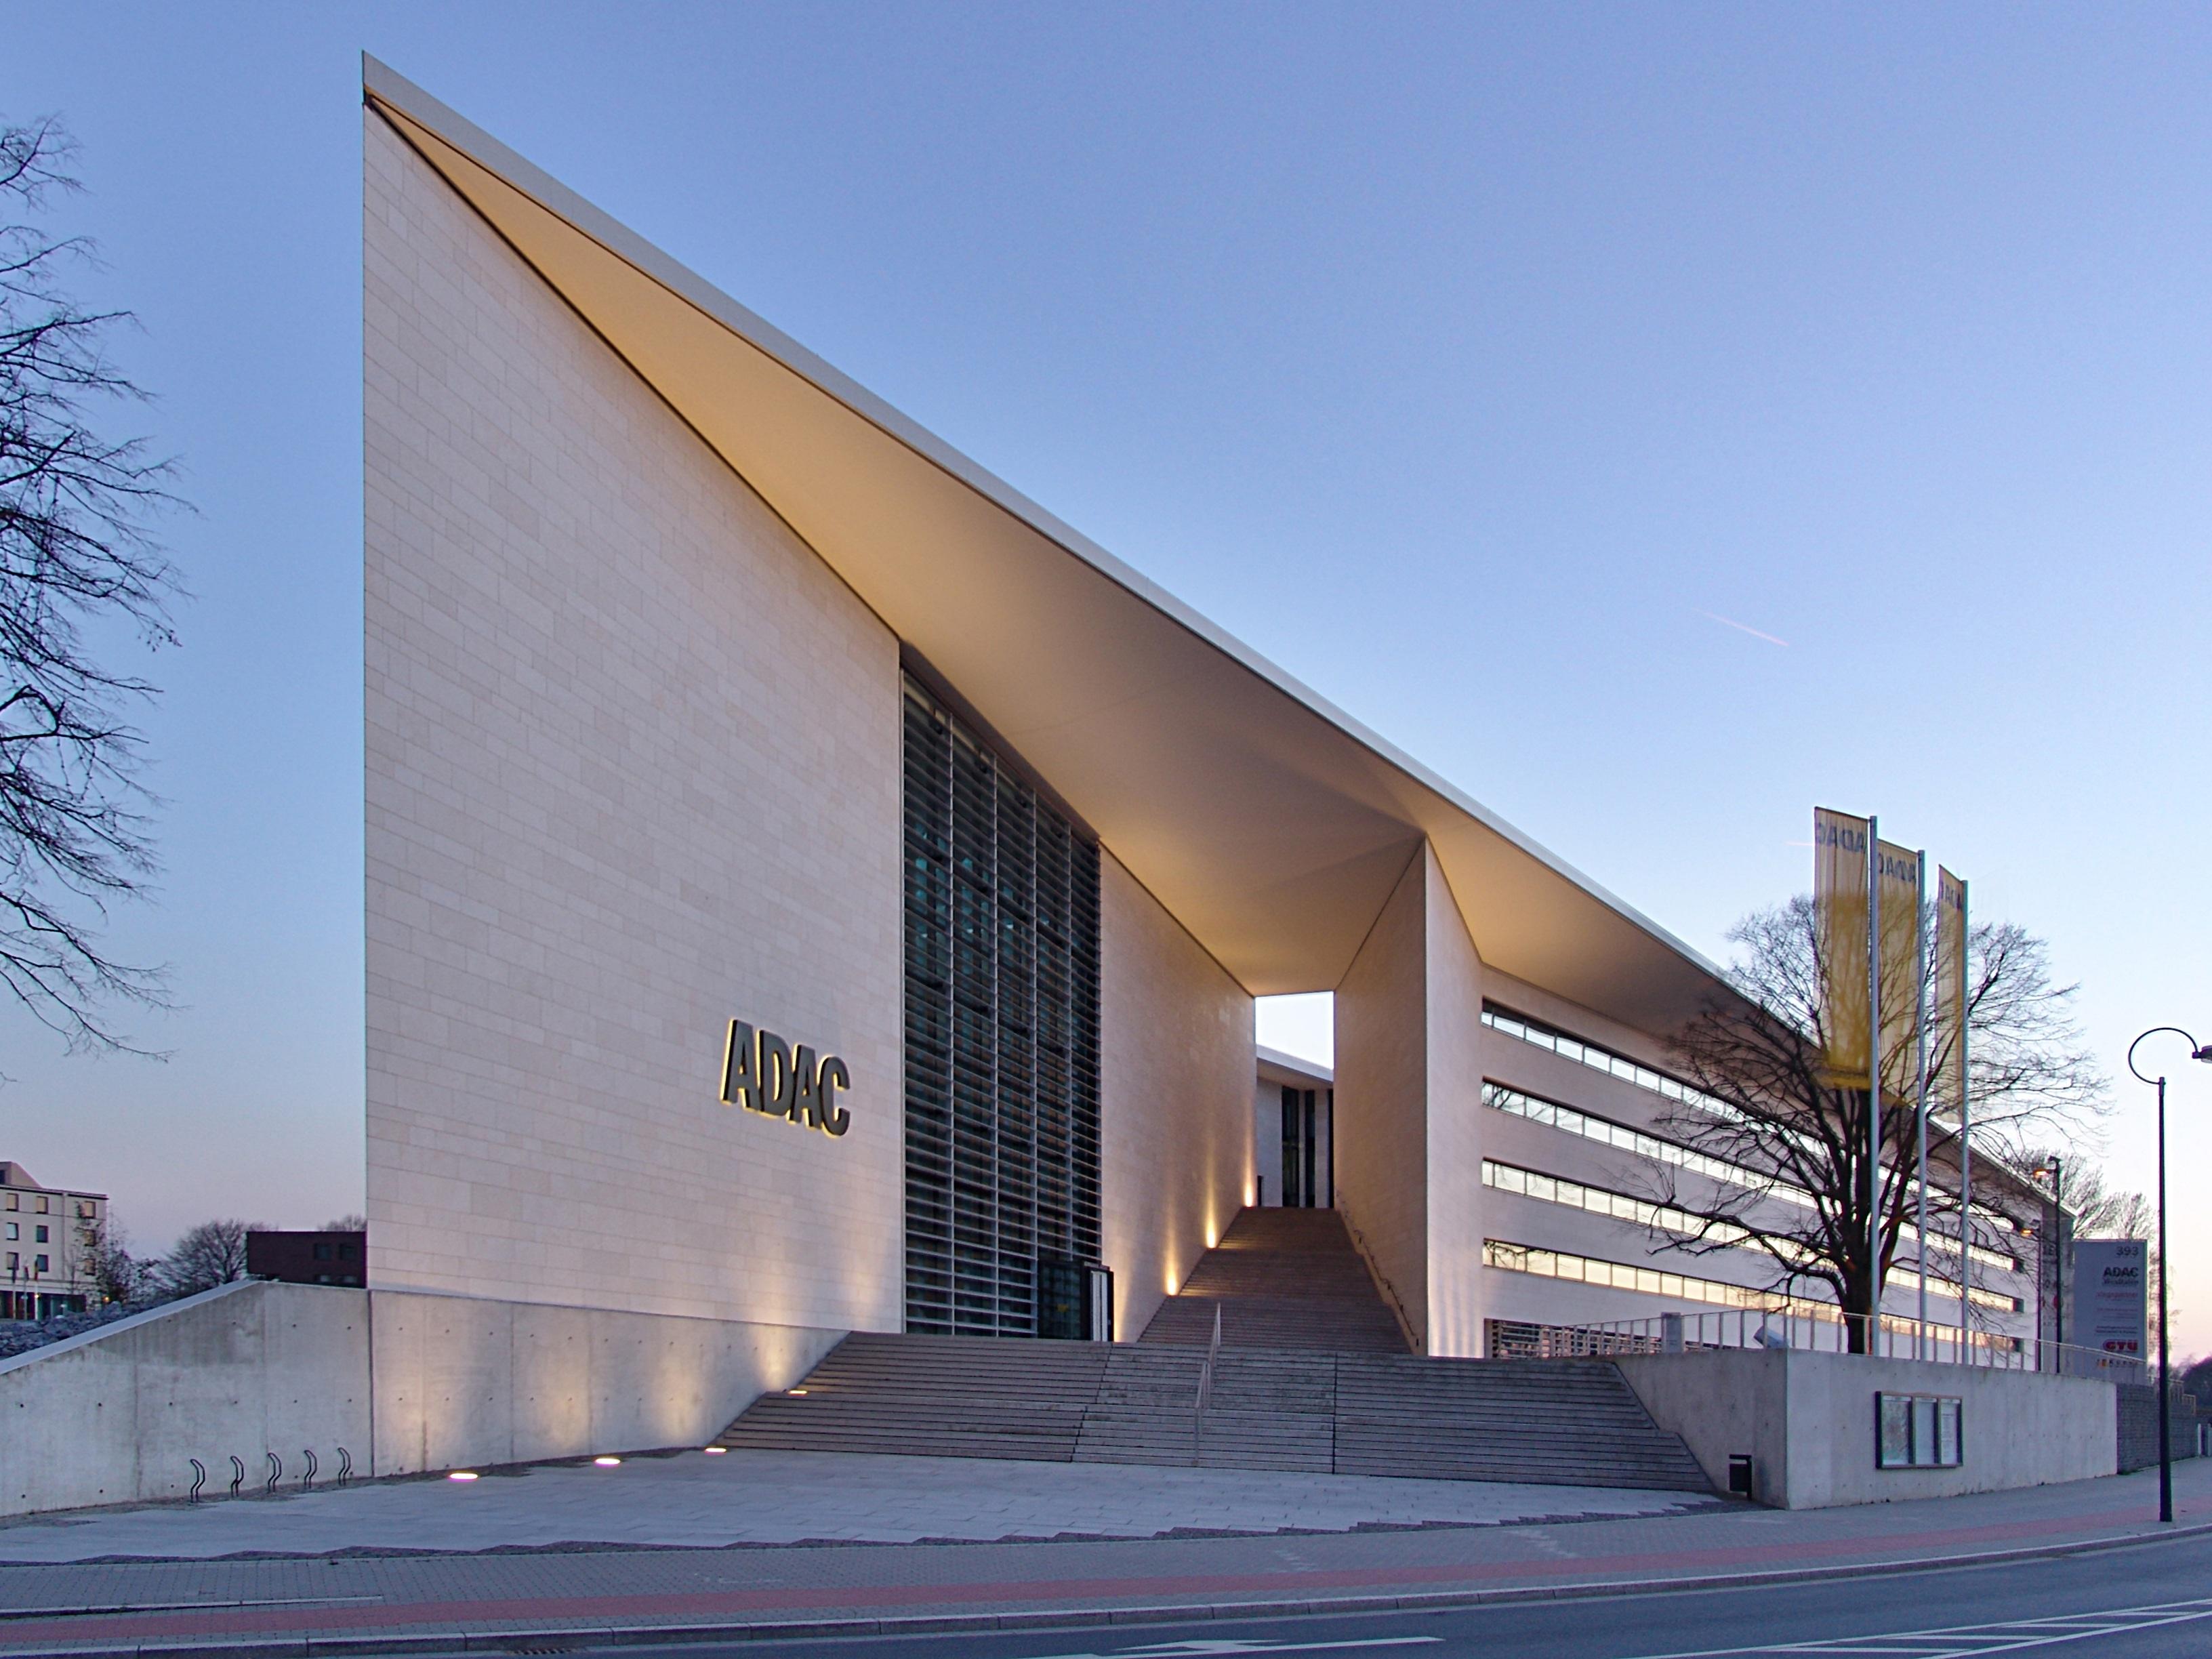 Free Images : structure, geometric, landmark, facade, professional ...